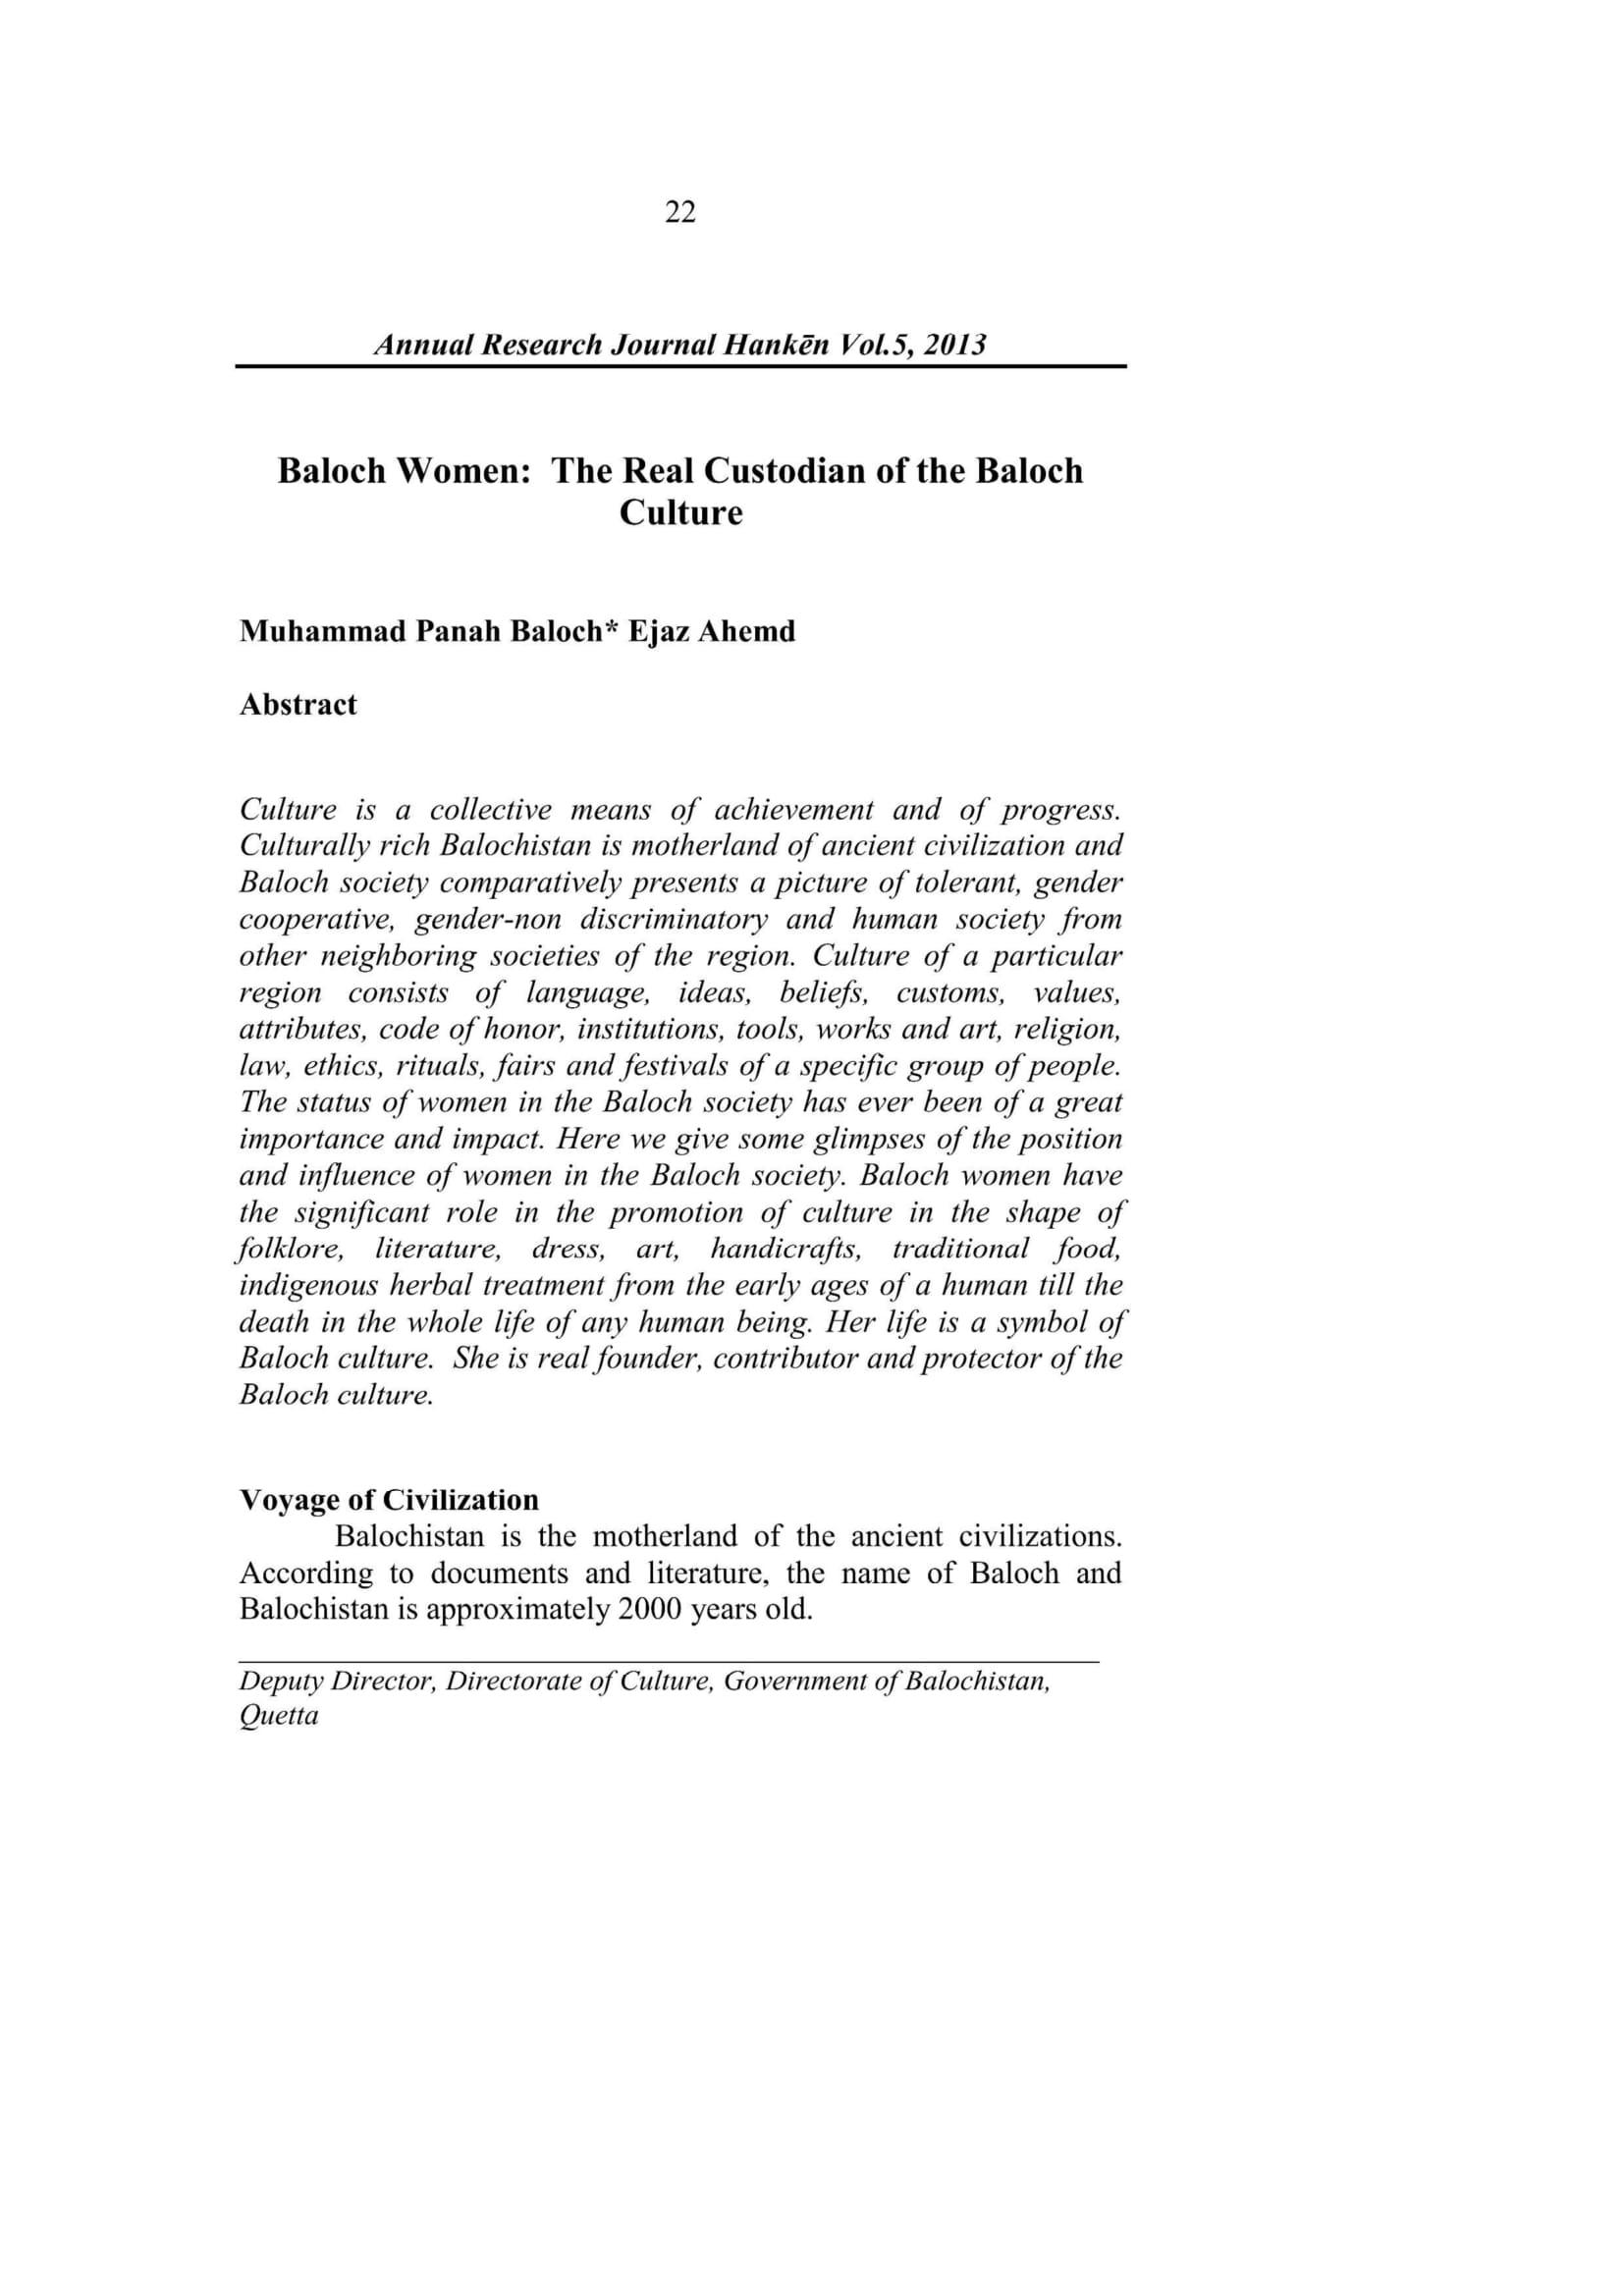 Baloch Women:  The Real Custodian of the Baloch Culture